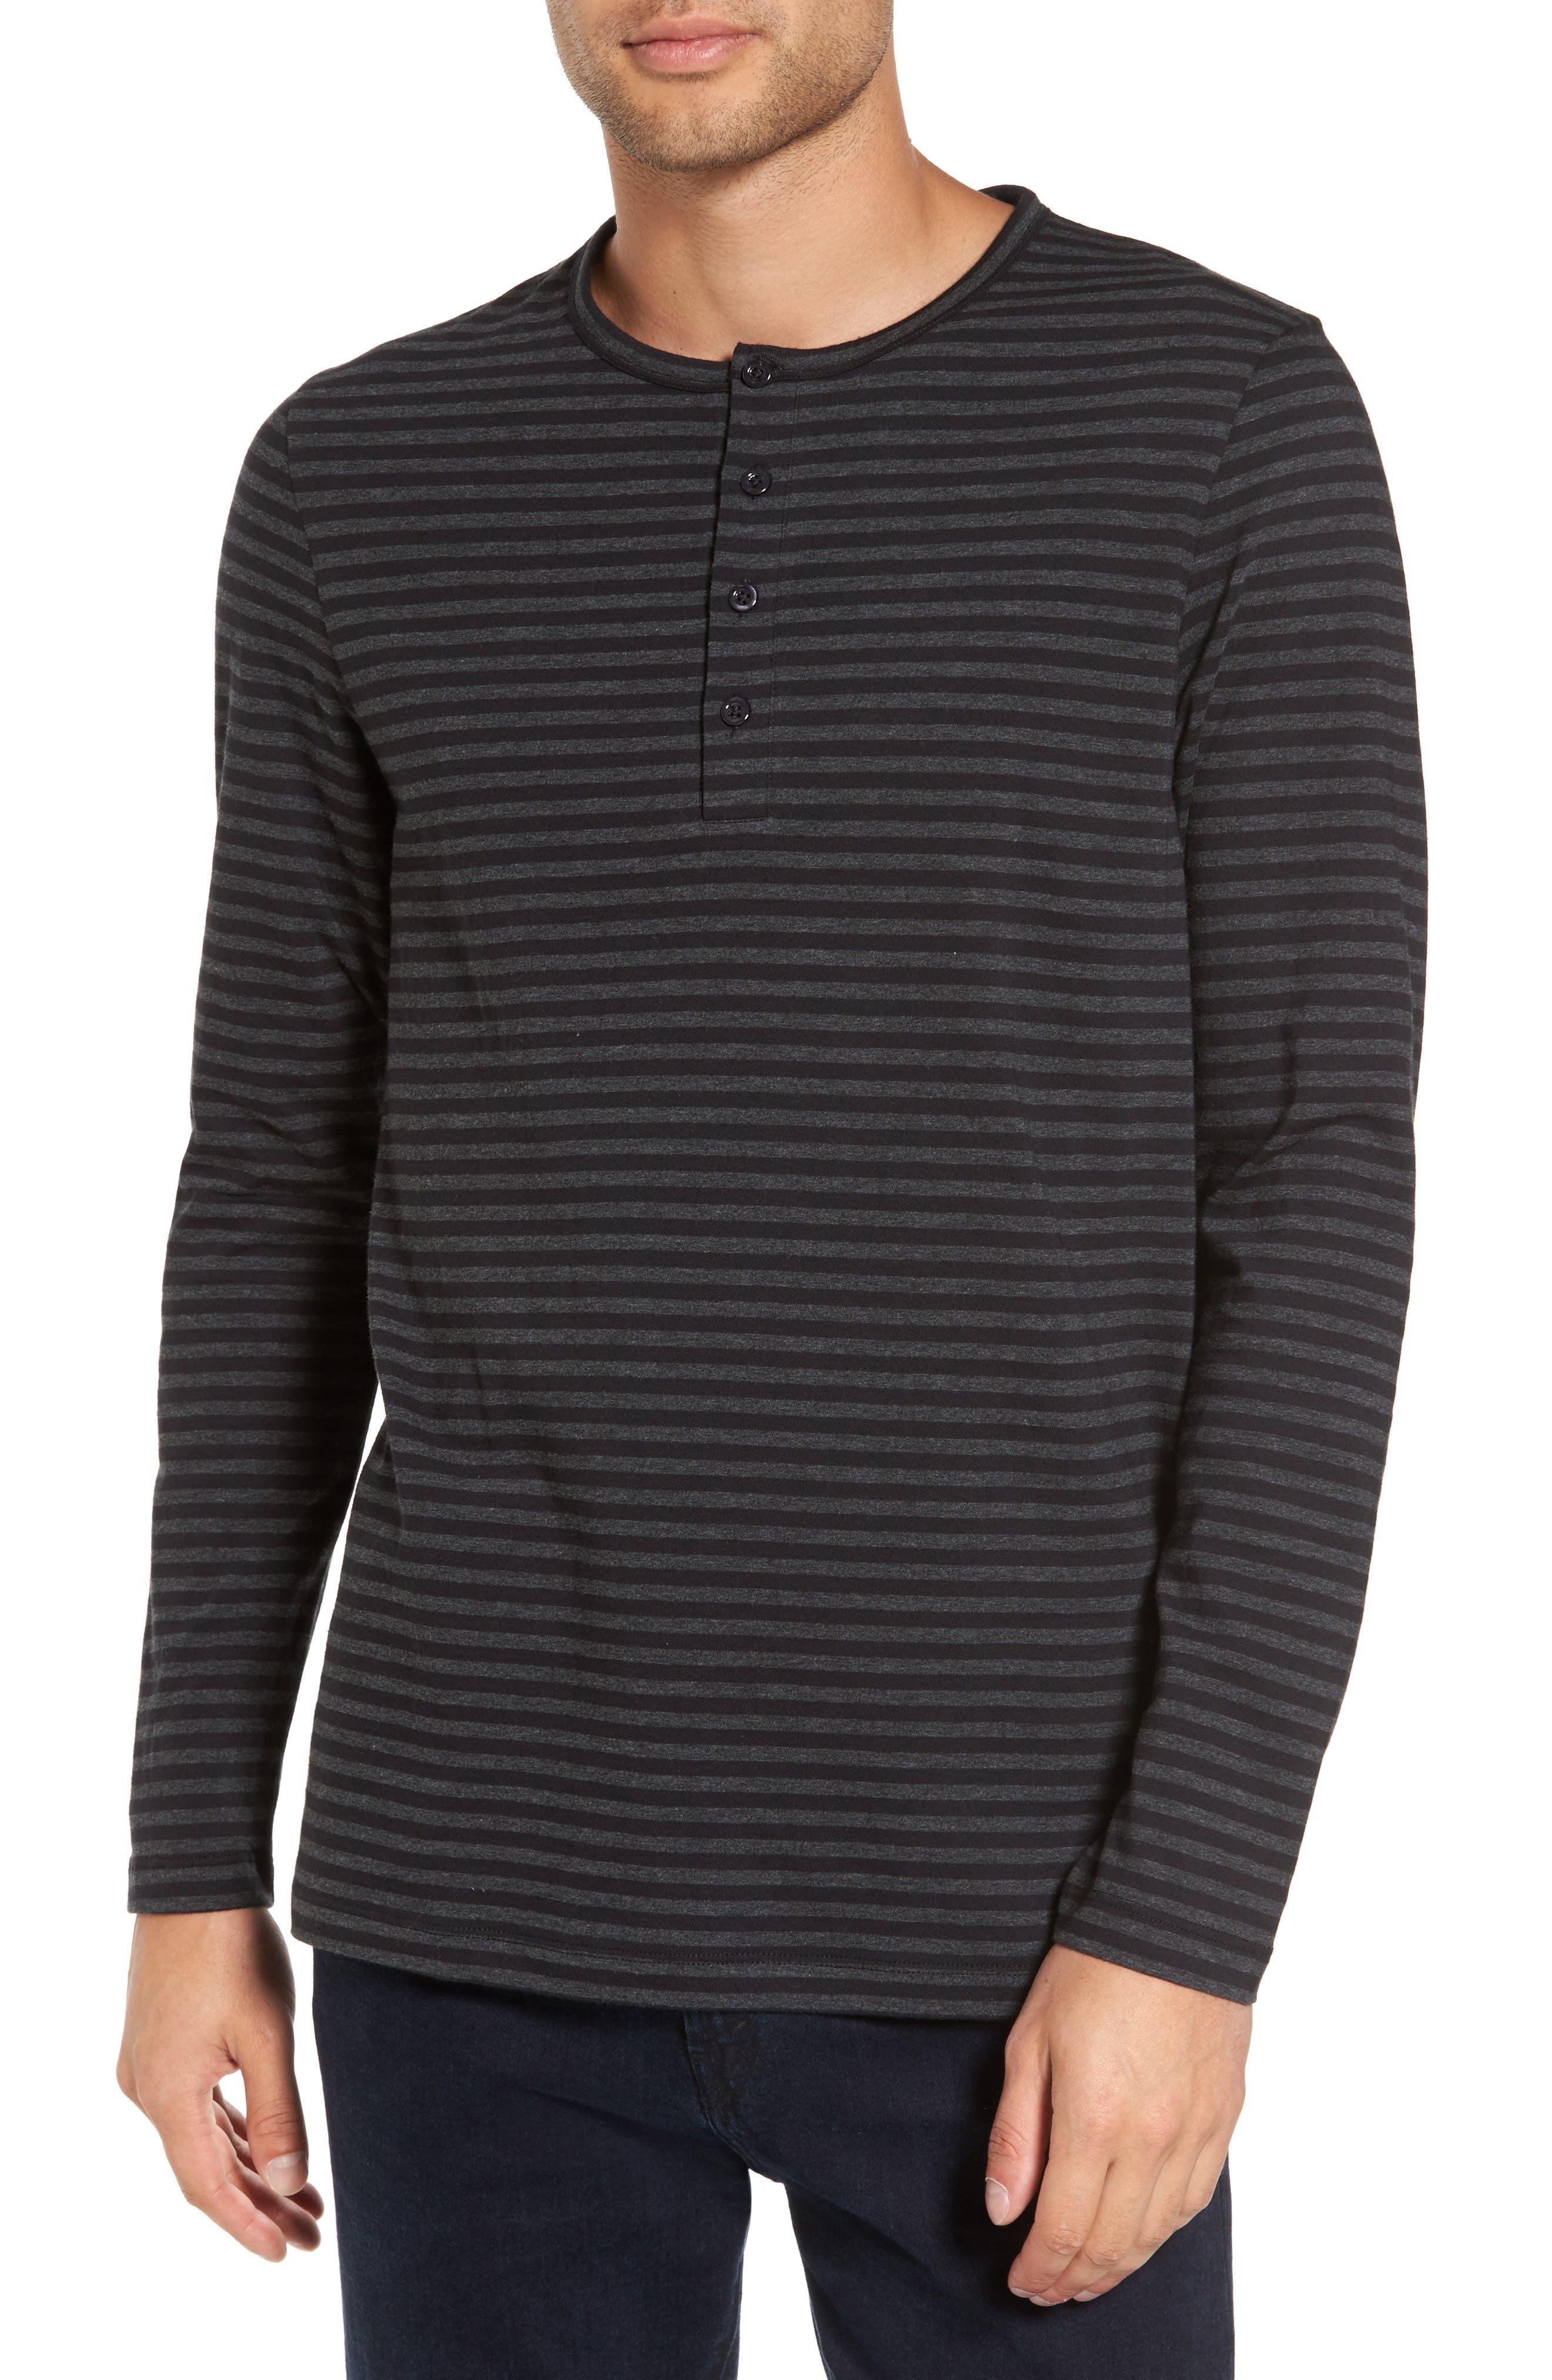 Long Sleeve Henley T-Shirt,                             Main thumbnail 1, color,                             Black/ Charcoal Stripe